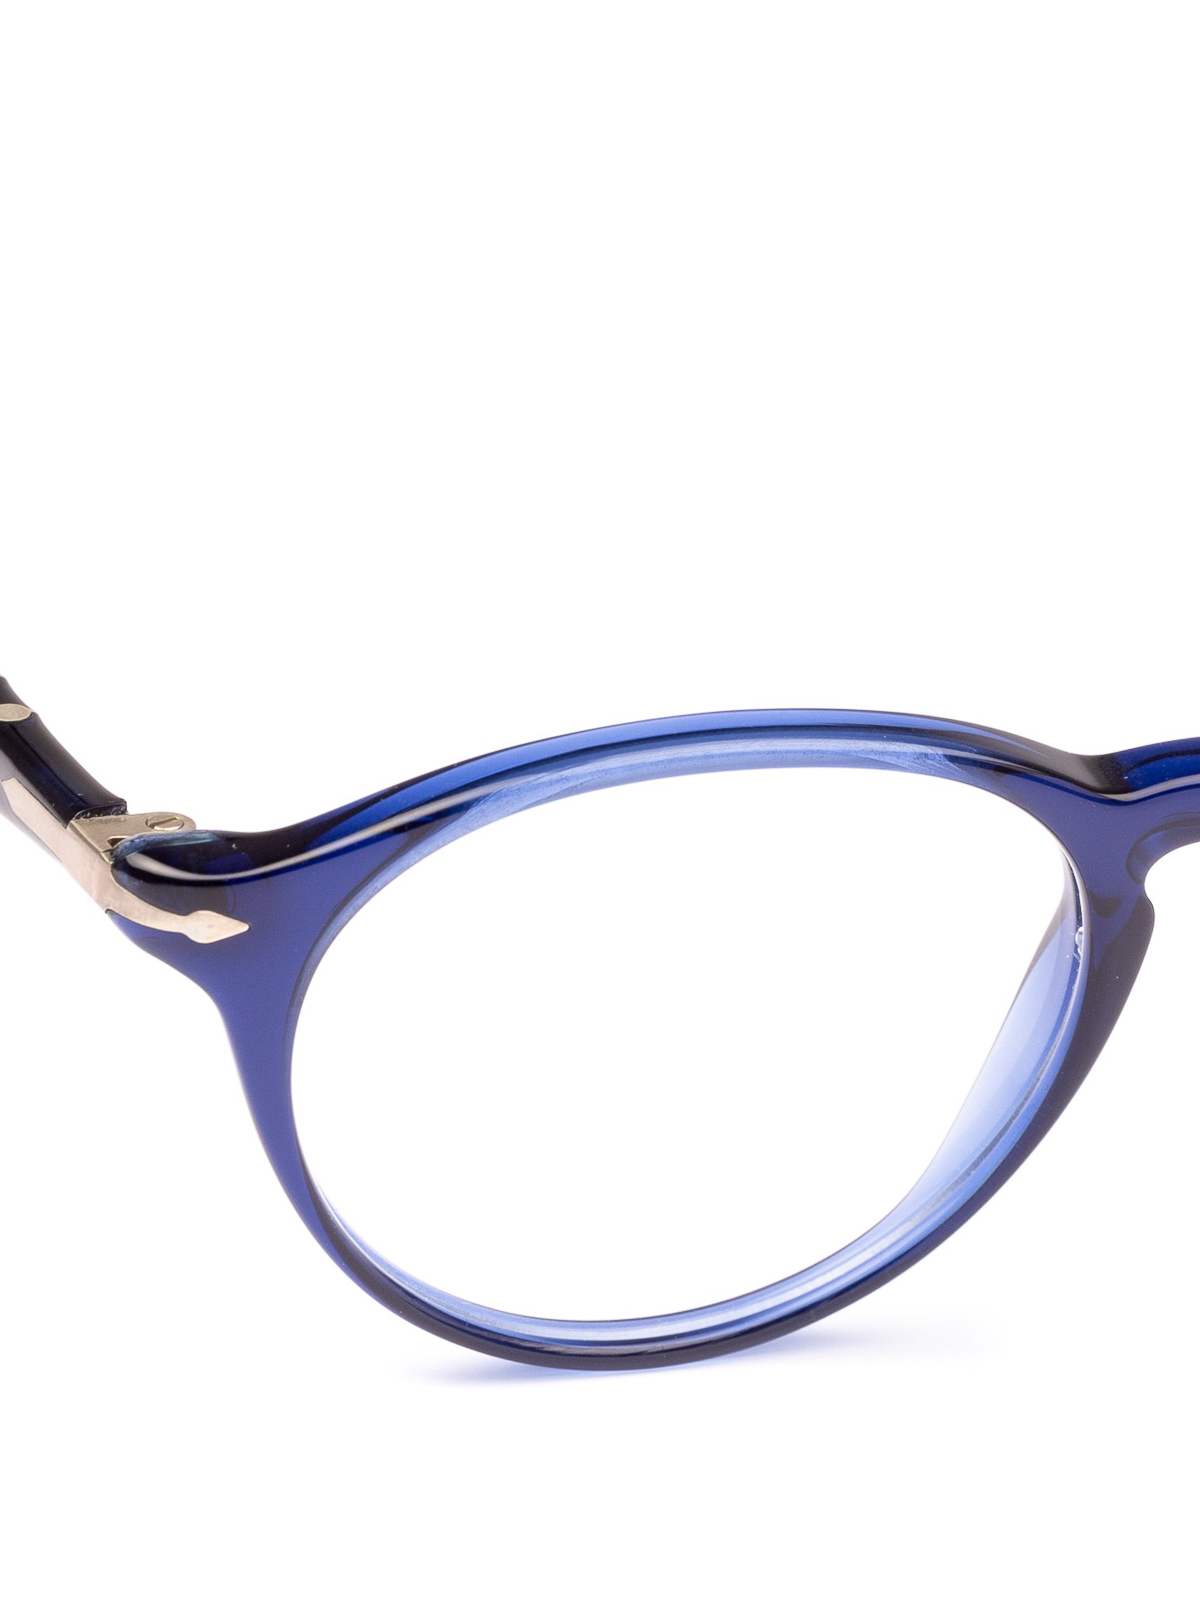 4326455521a5e Persol - Token blue eyeglasses - glasses - PO 3092V 9038